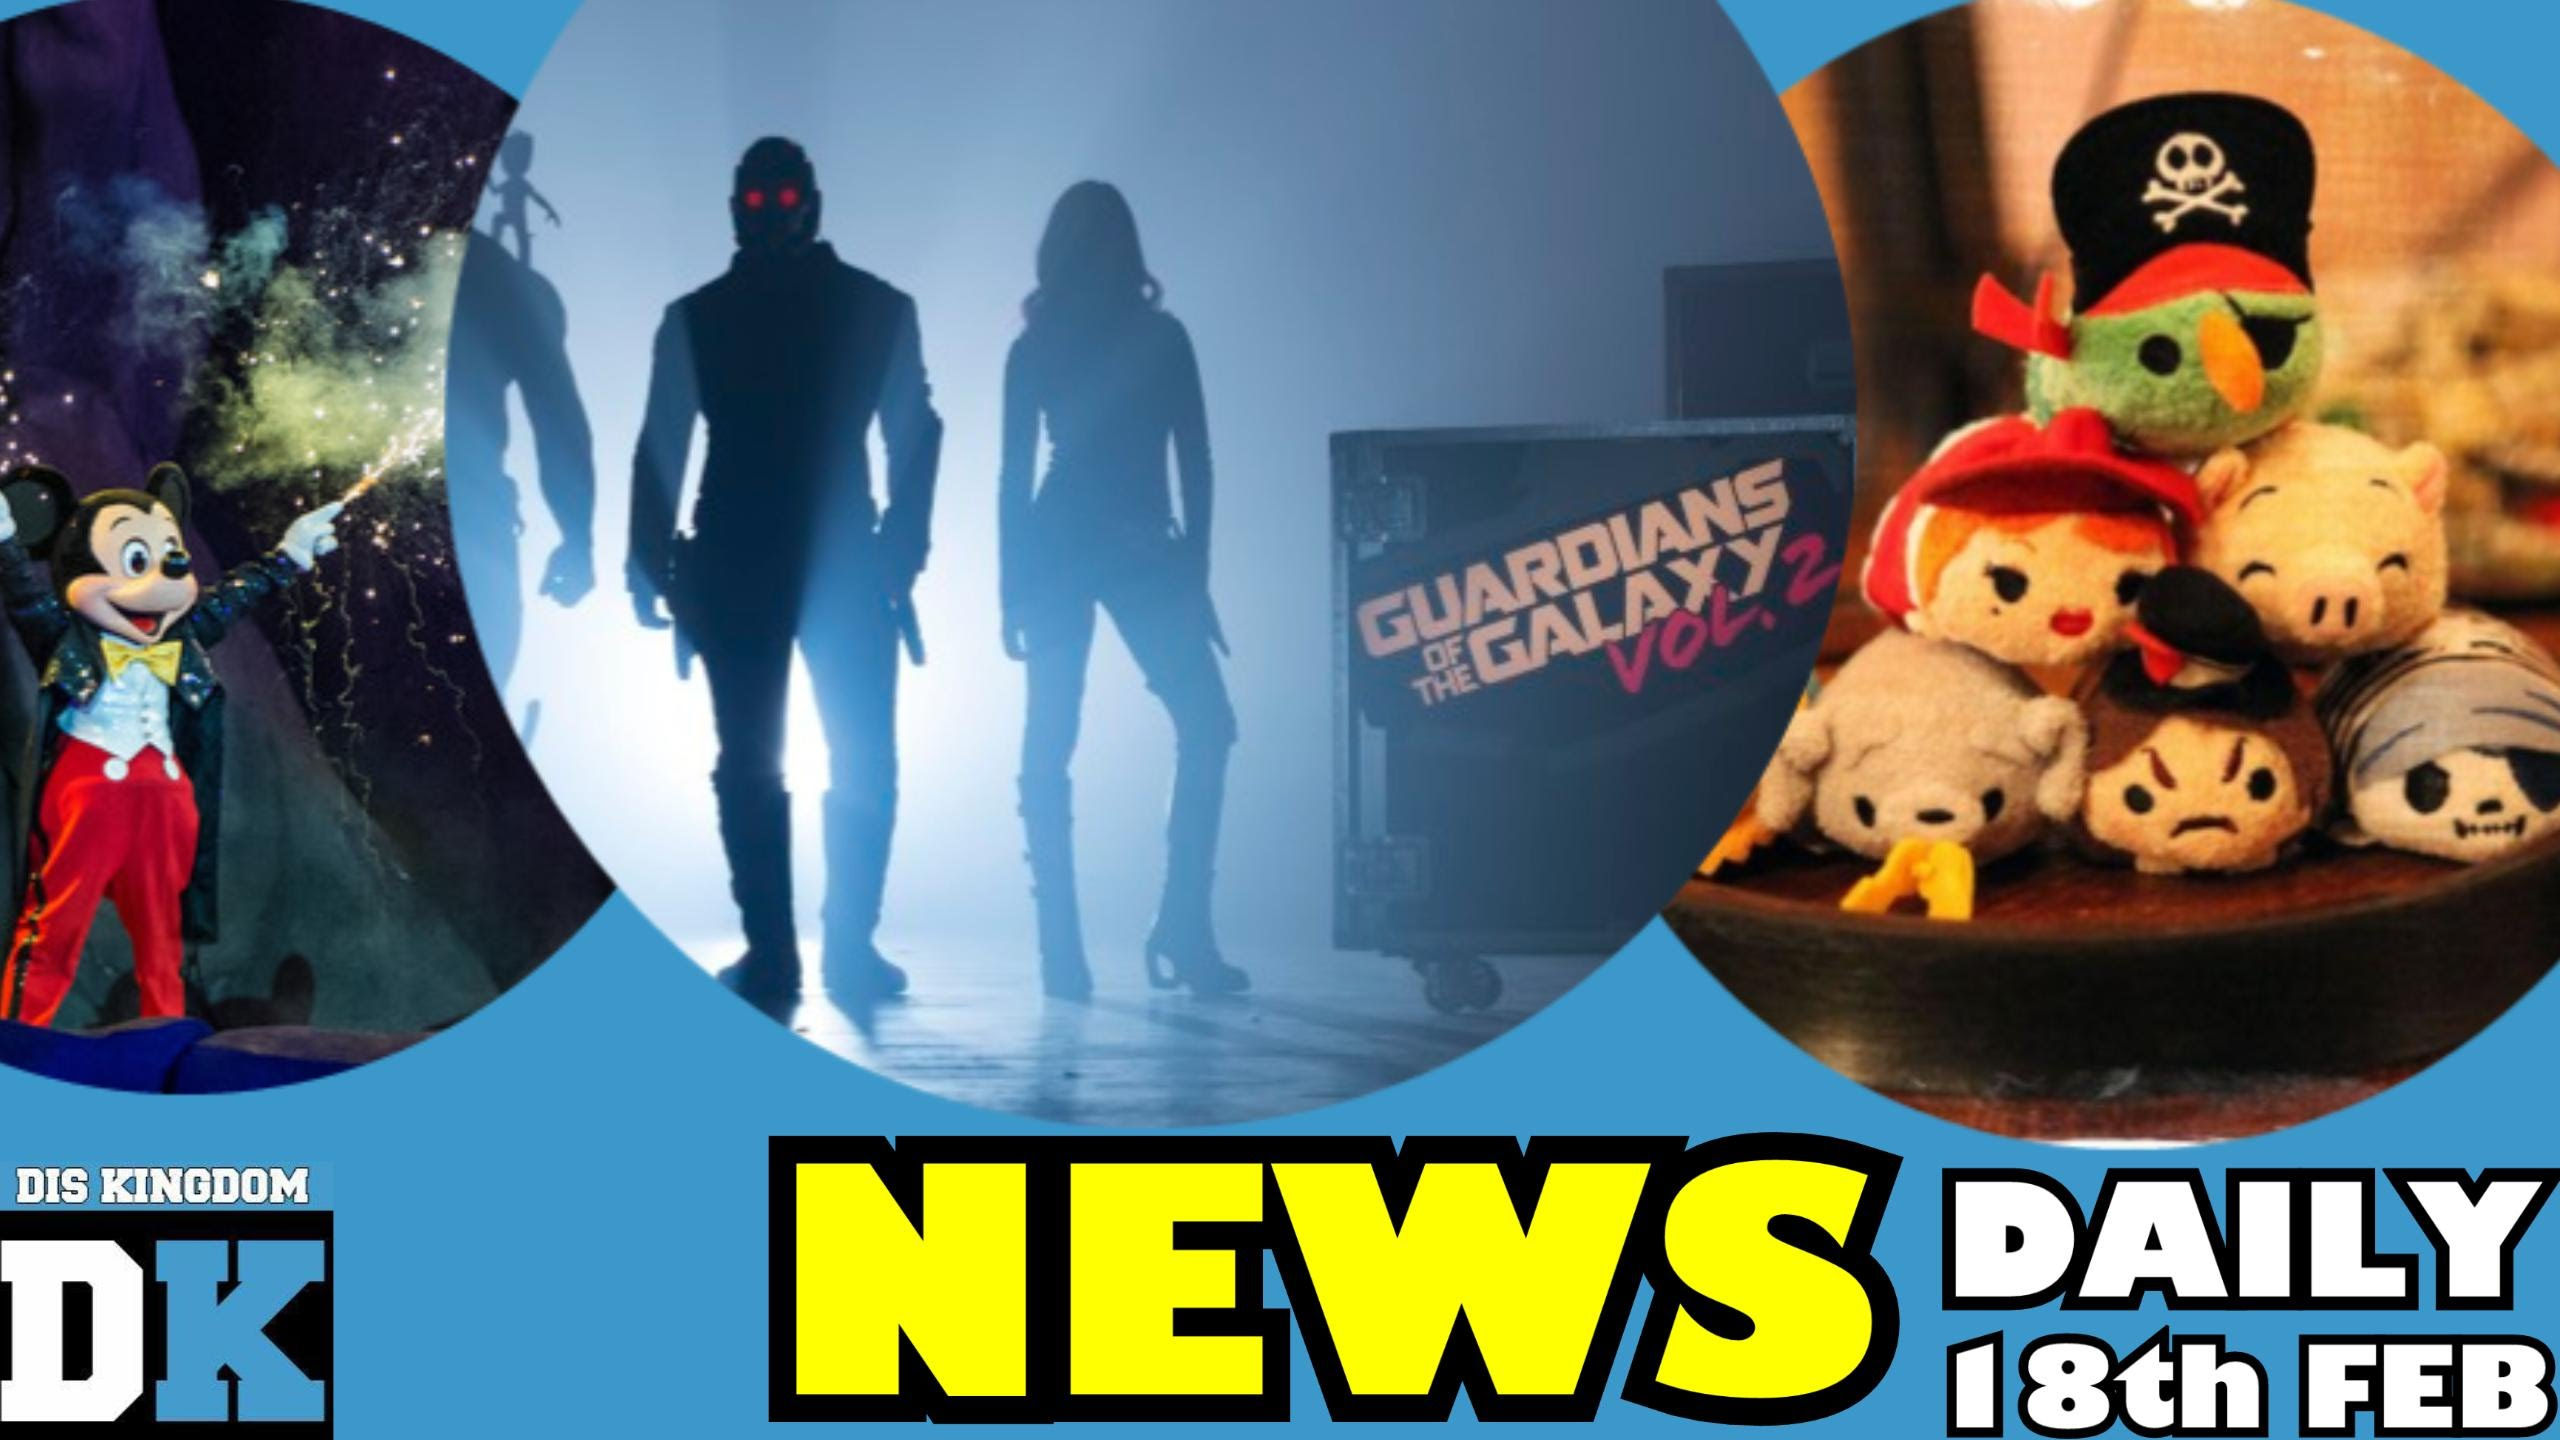 GOTG 2 Vol 2 + POTC Tsum Tsums + Shanghai Disney Effecting Walt Disney World – Daily Disney News